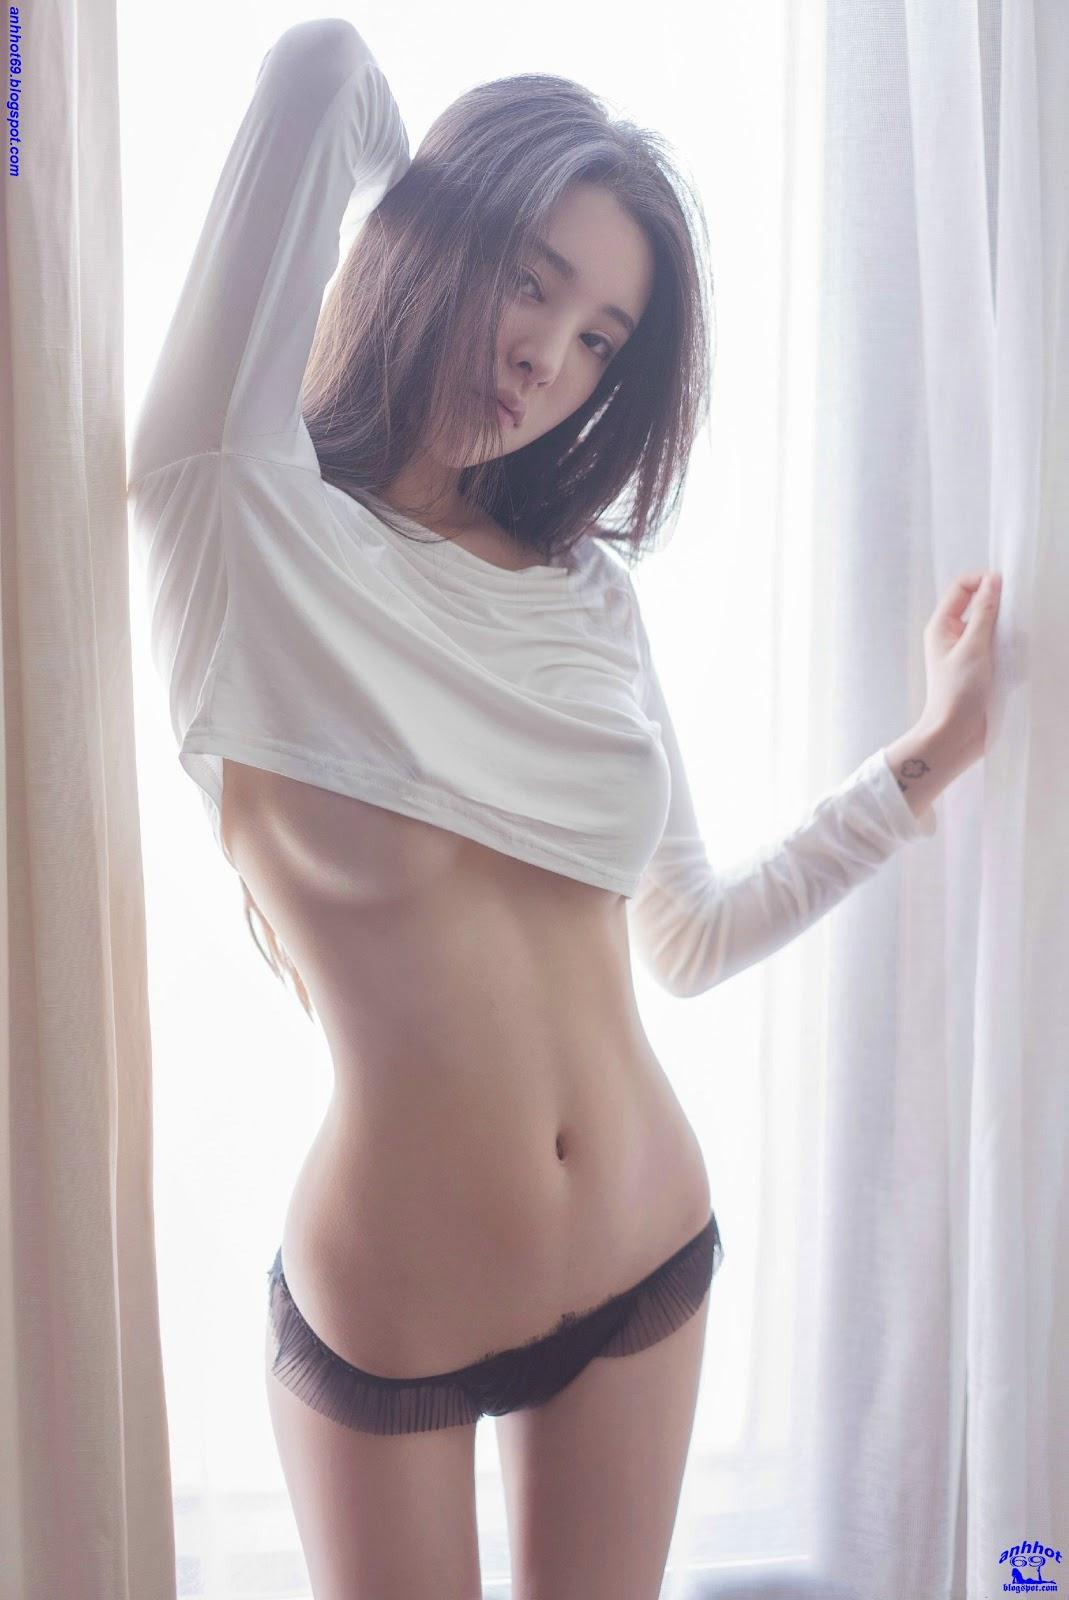 Chen_Darongl_150716_01